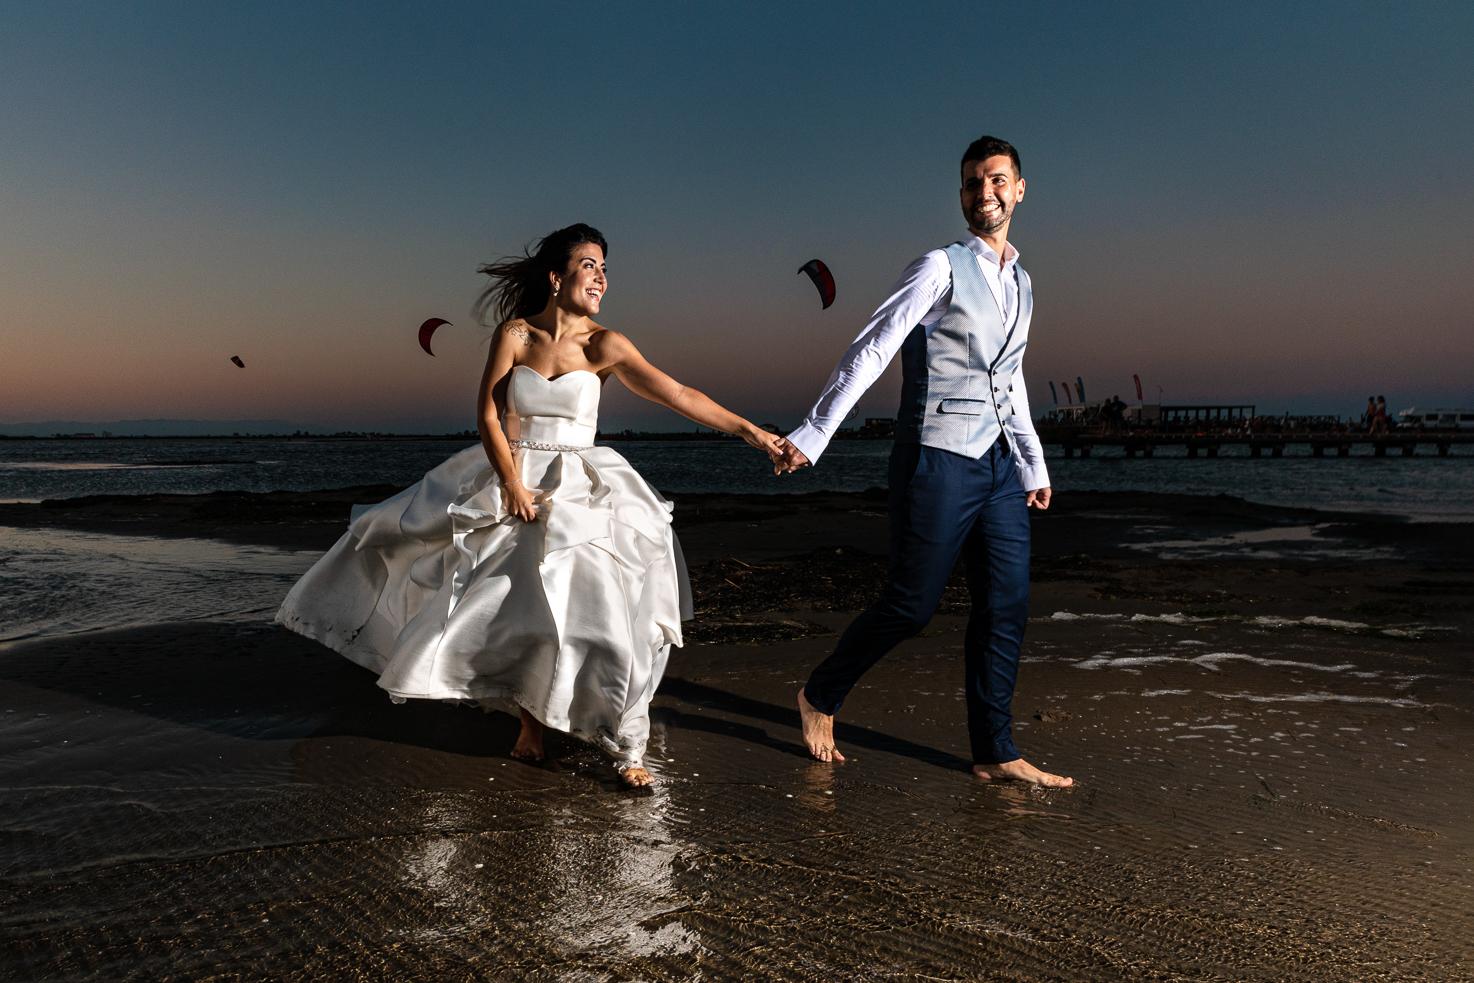 recuerdos bodas imagenes fotografias fotos casamiento